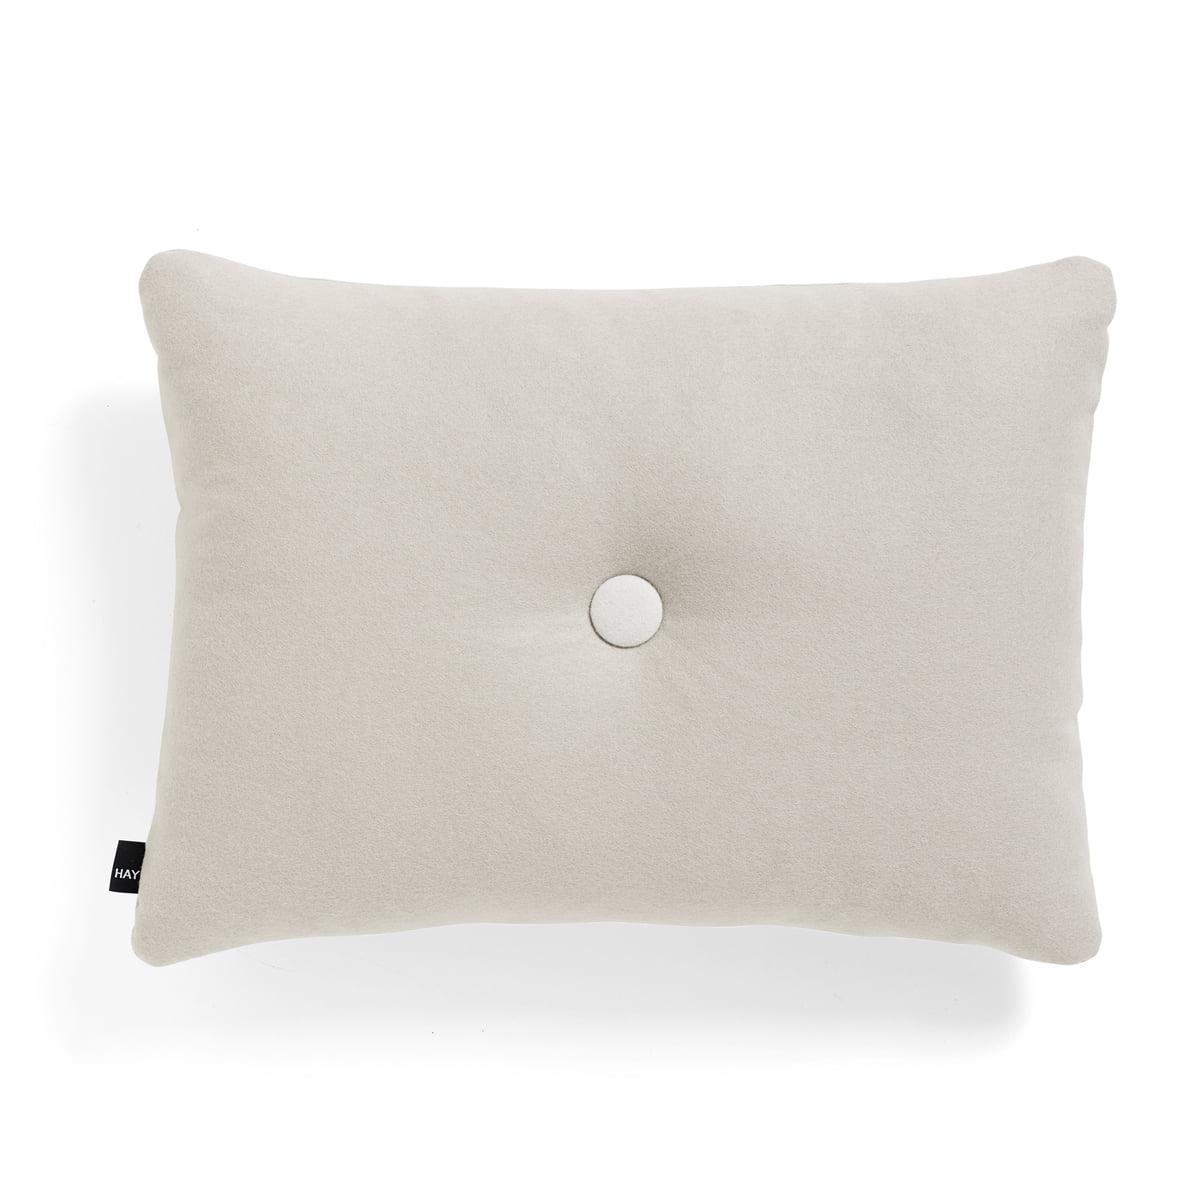 Hay   Cushion Dot 45 X 60 Cm Hero, Beige 211